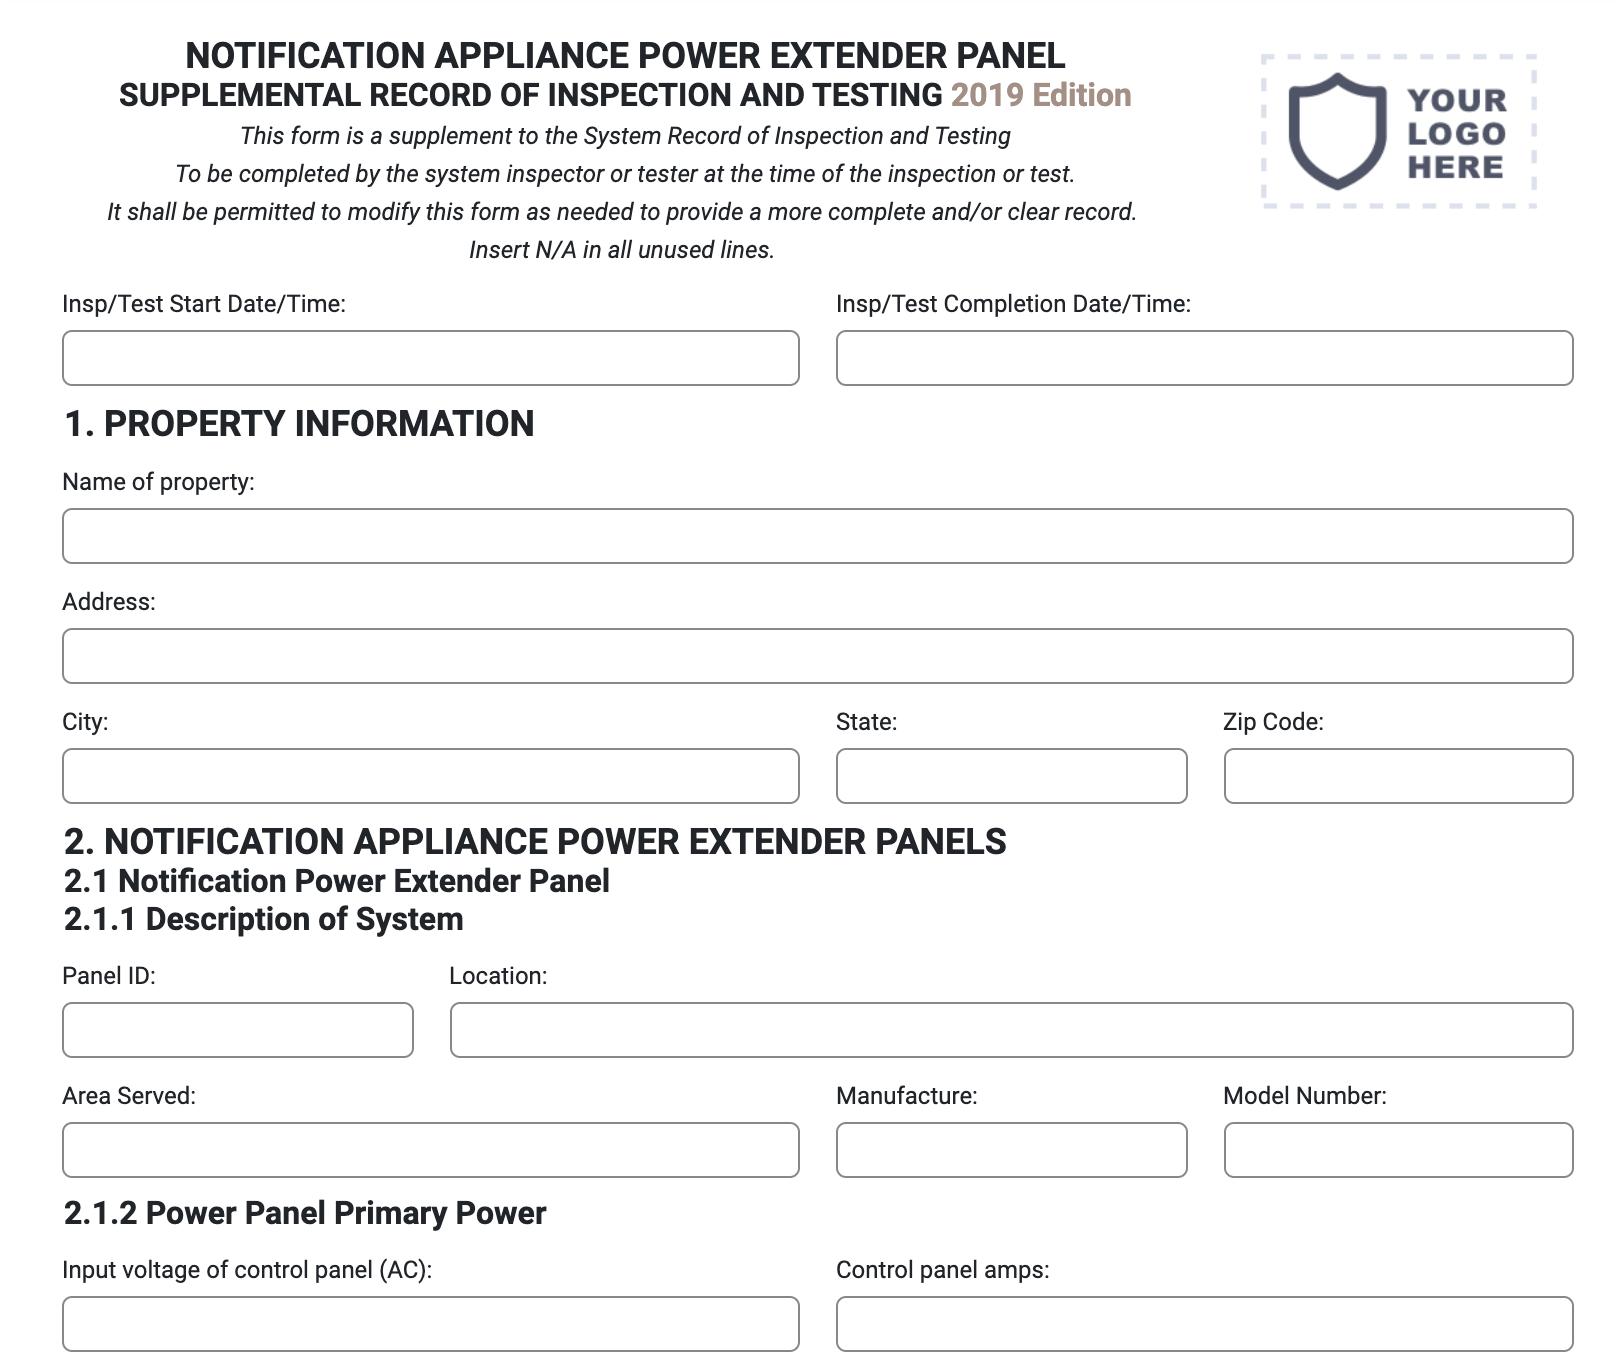 Notification Appliance Power Extender Panel Form